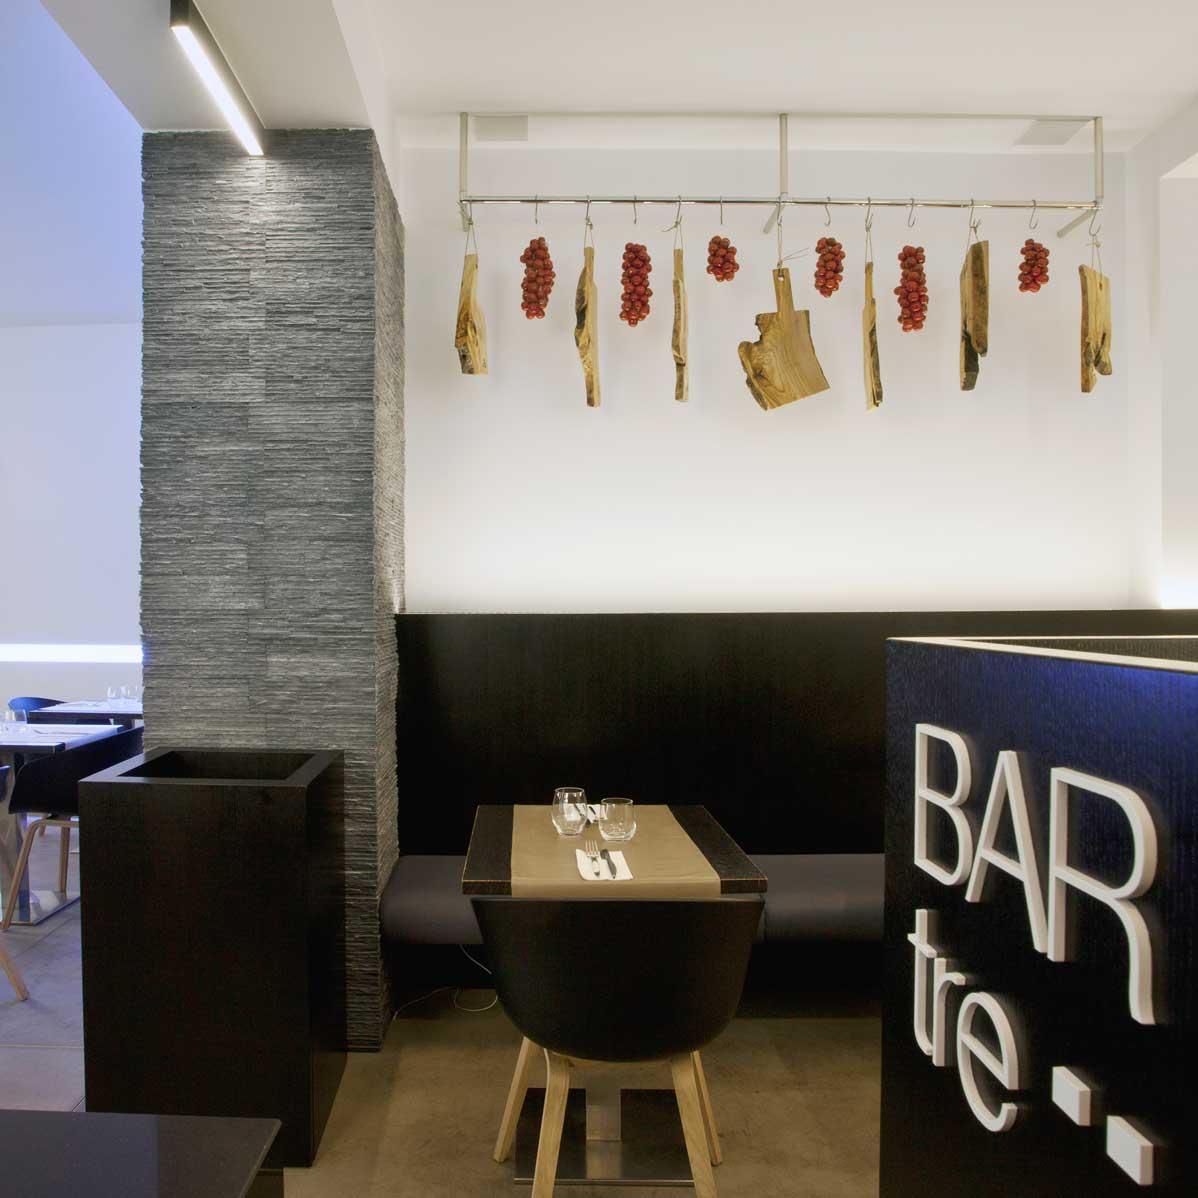 Bar-Tre-2.jpg